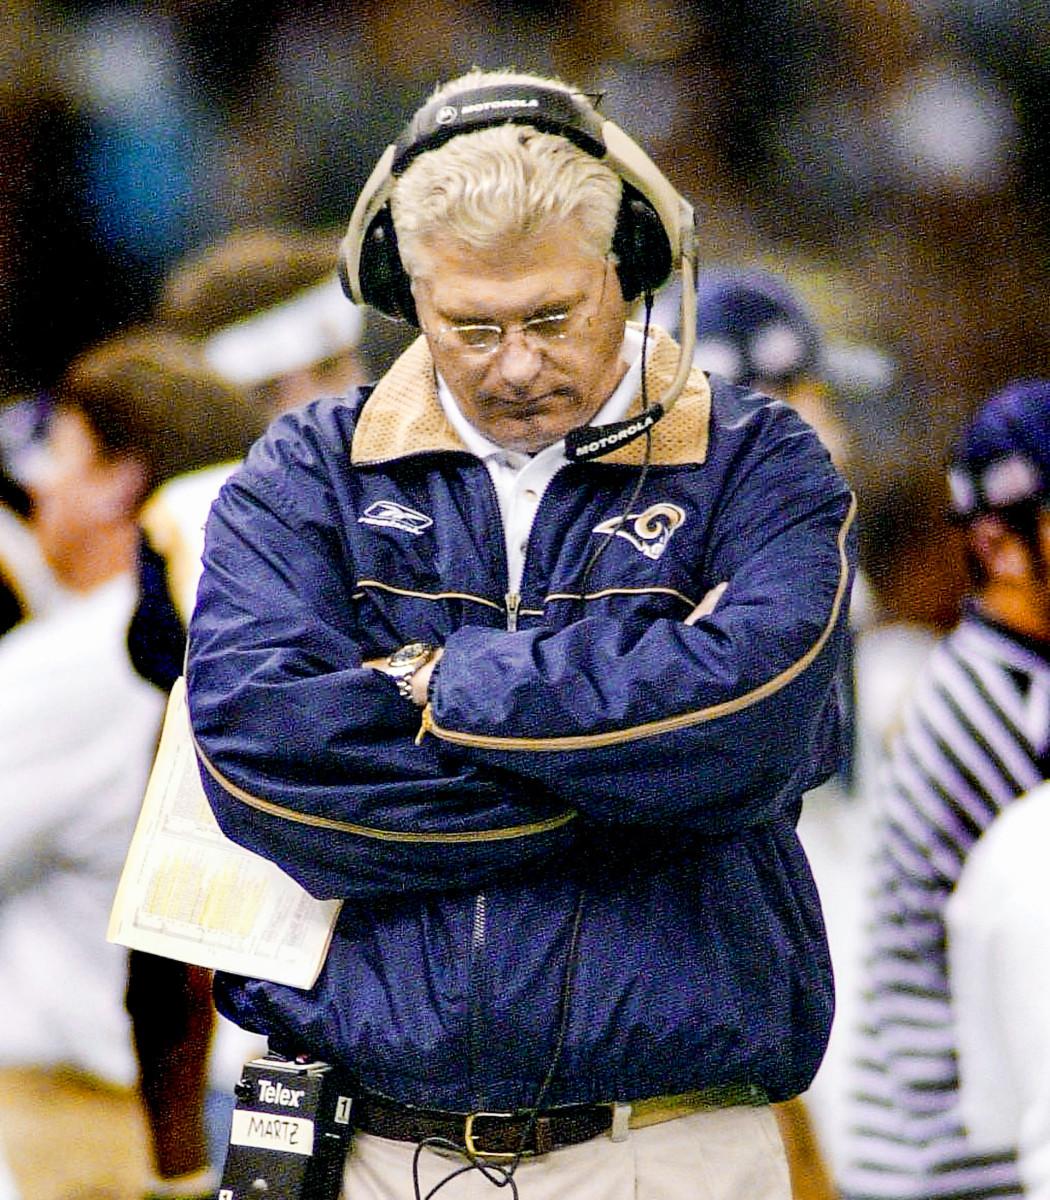 Former Rams coach Mike Martz